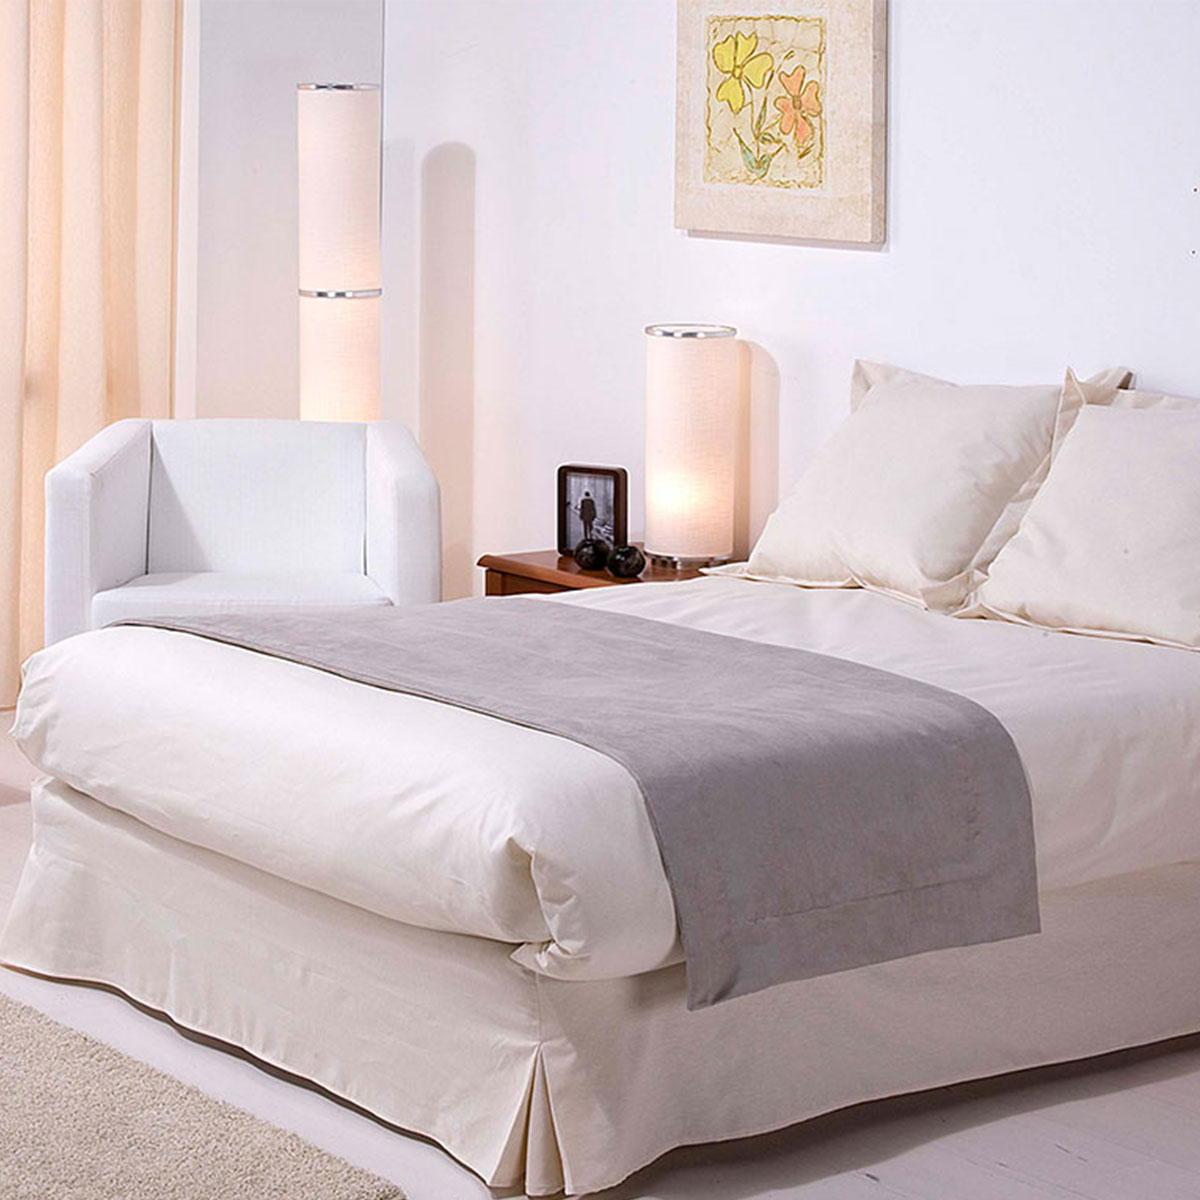 chemin de lit tildou r versible standard textile. Black Bedroom Furniture Sets. Home Design Ideas